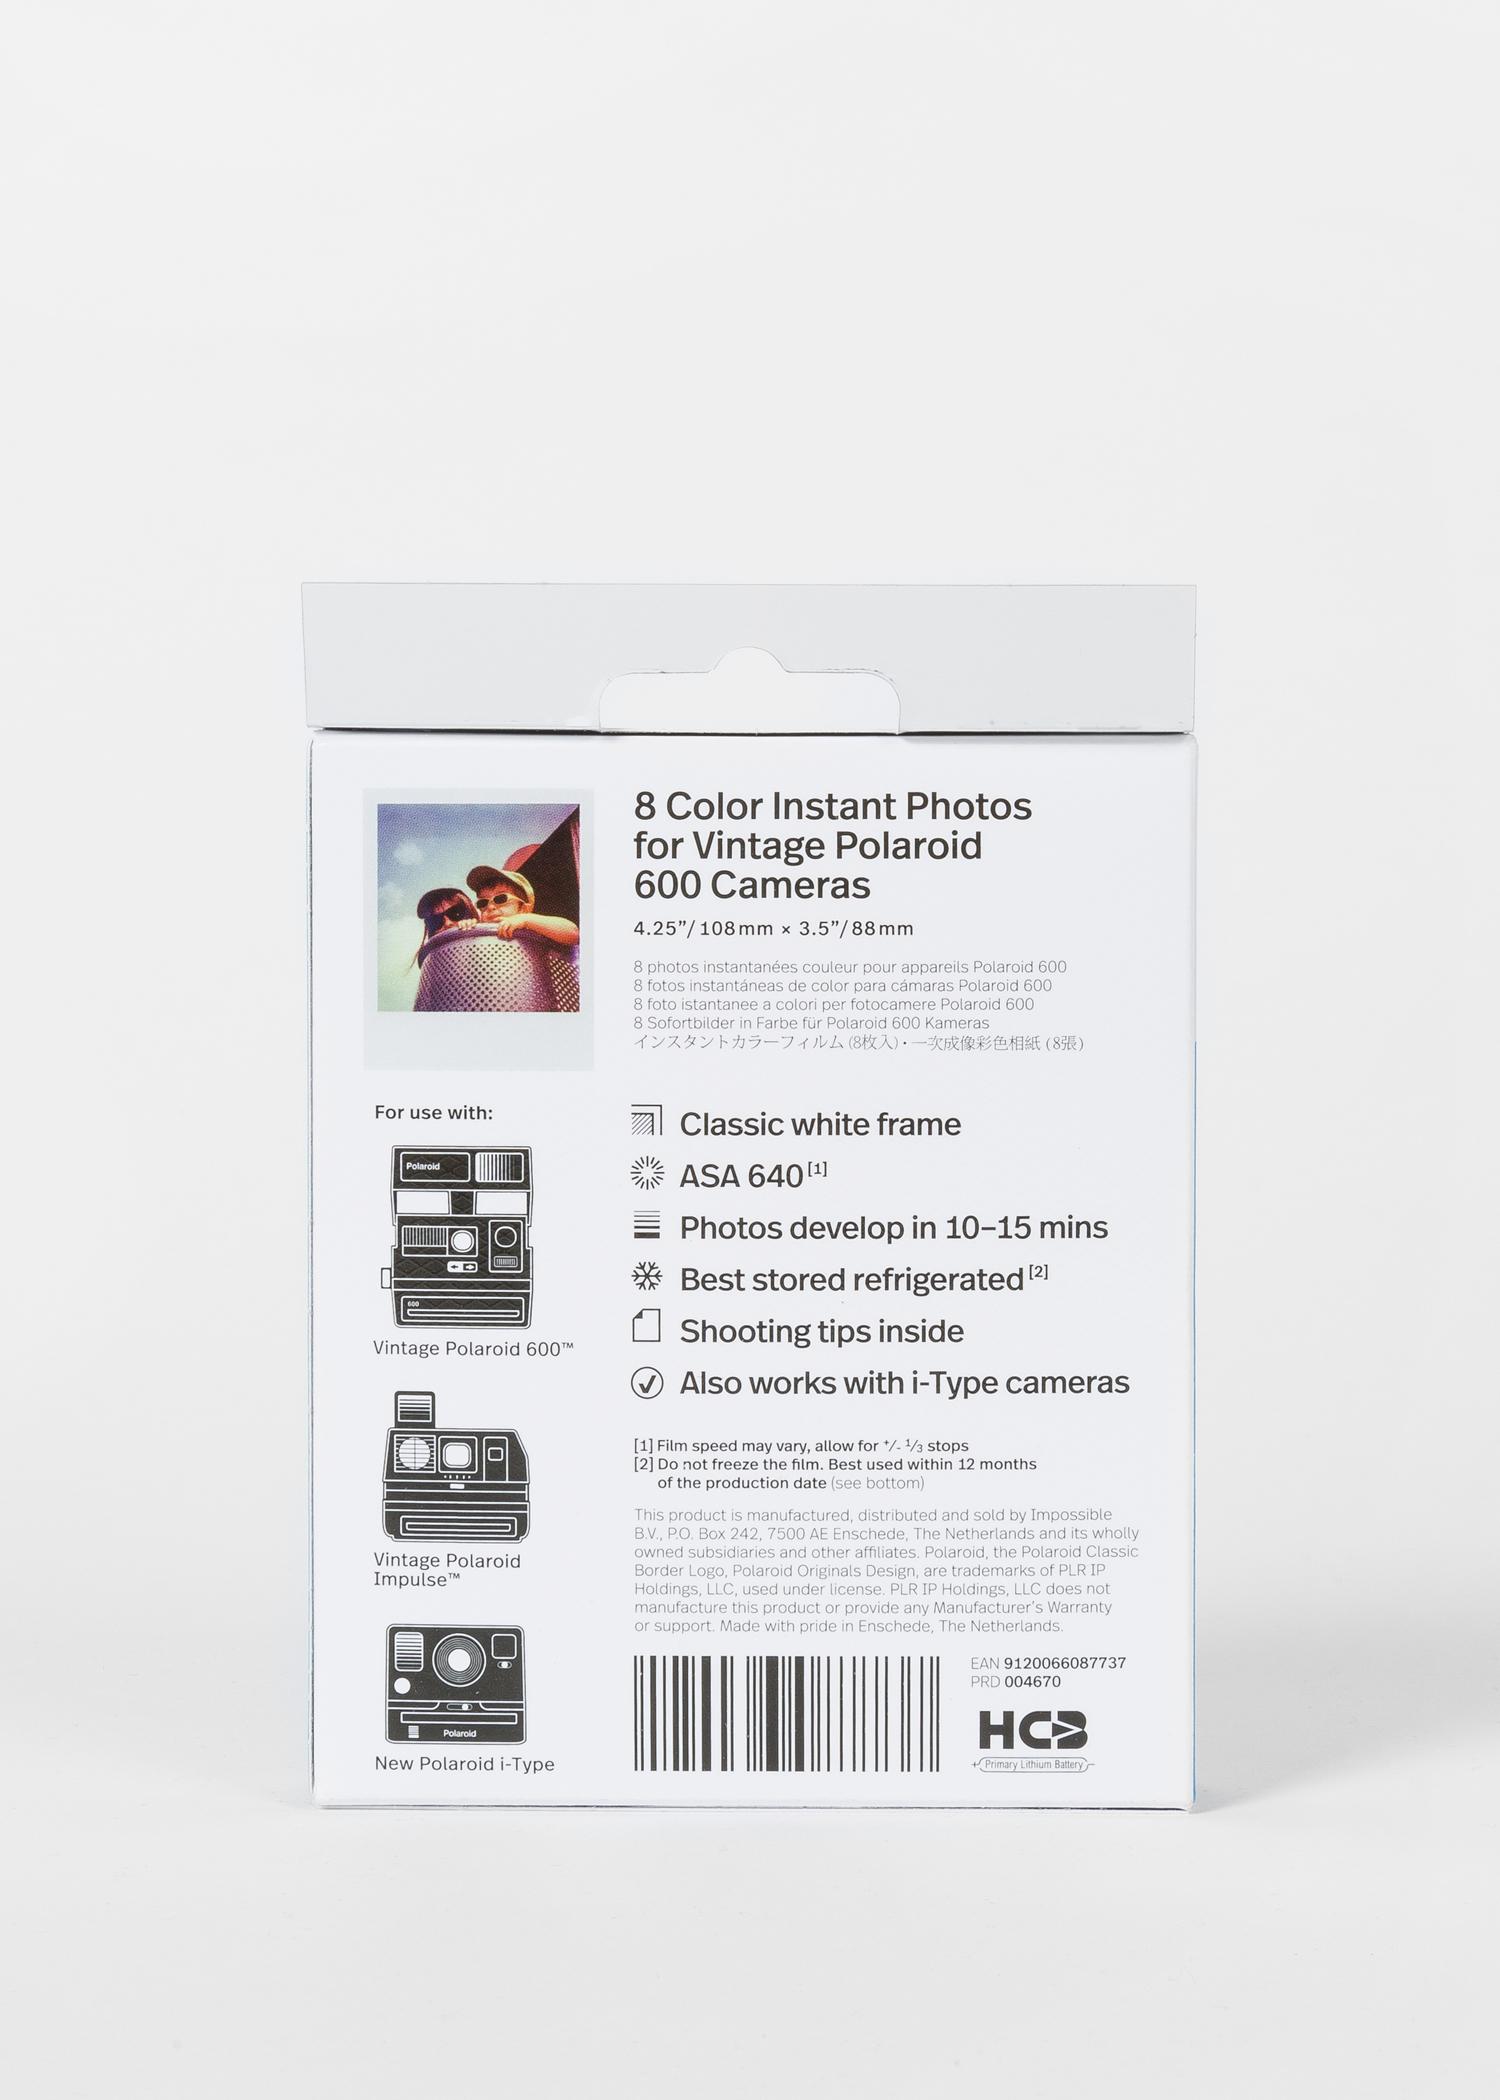 Polaroid - Film Couleur Pour Appareil 600   i-Type - Paul Smith Francais e61f55cf48b0